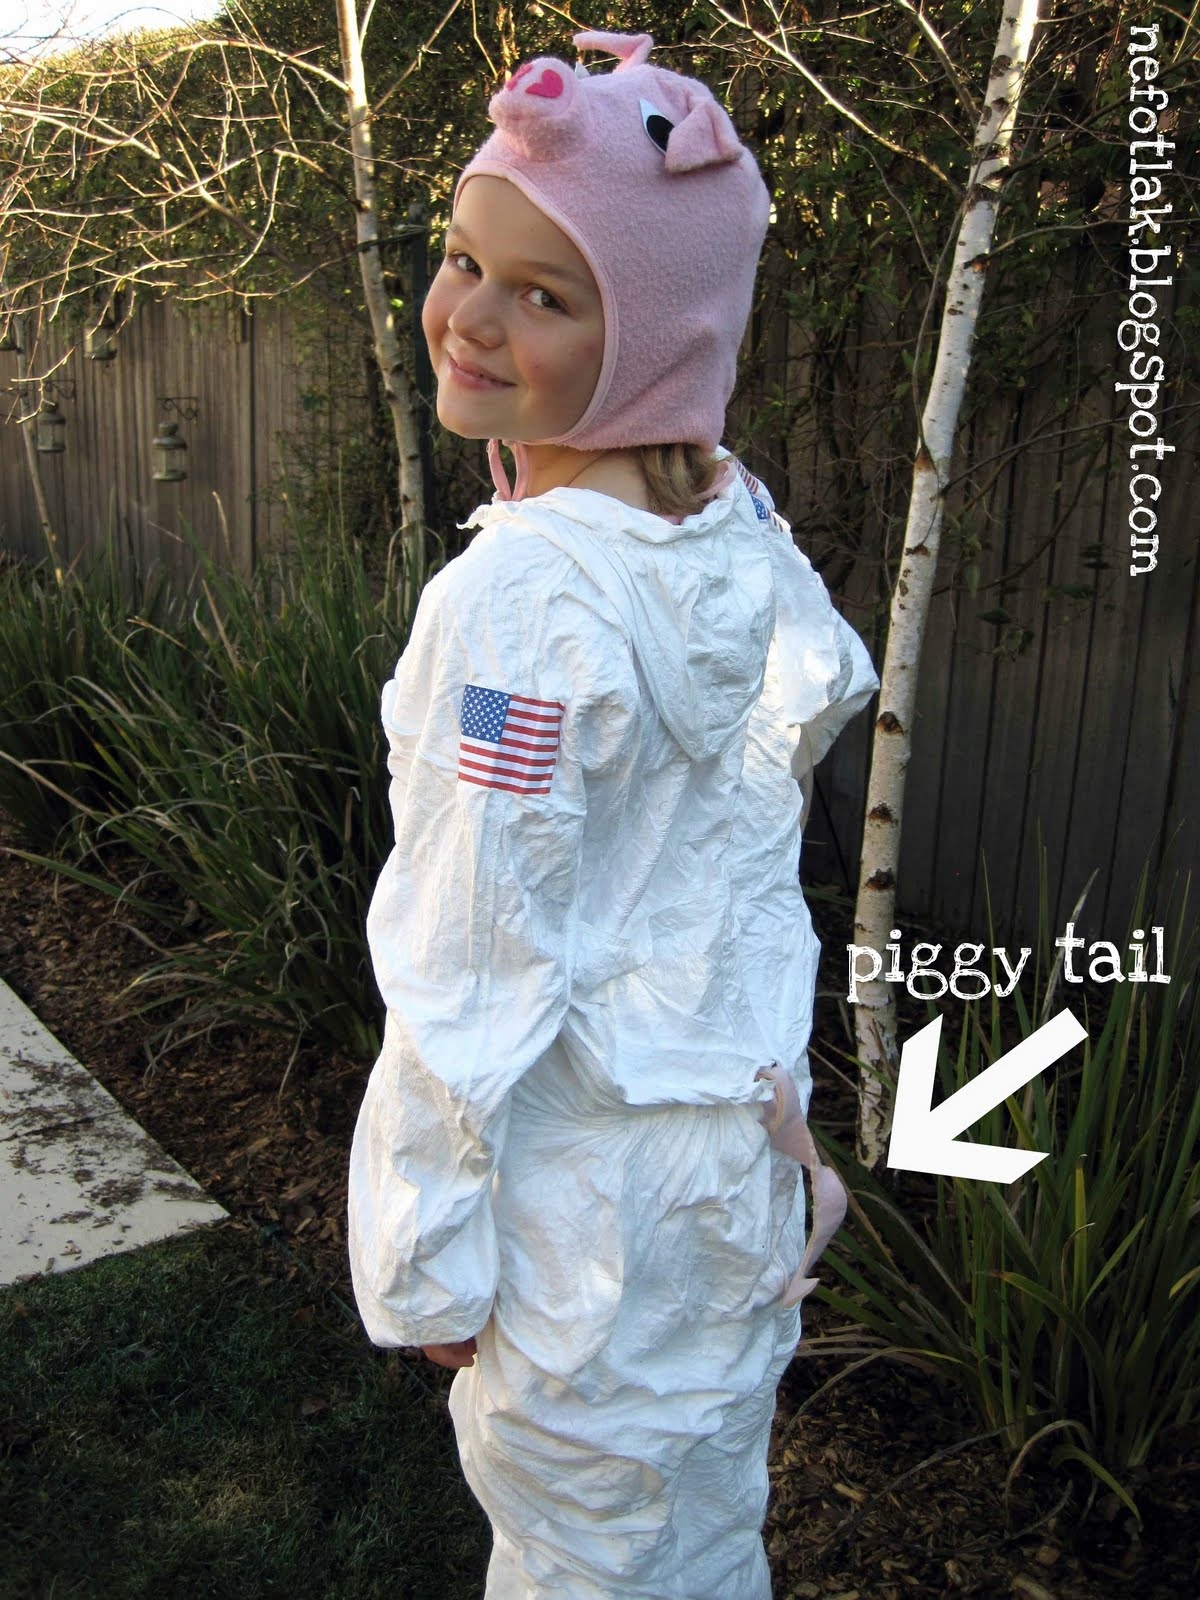 space suit costume diy - photo #25